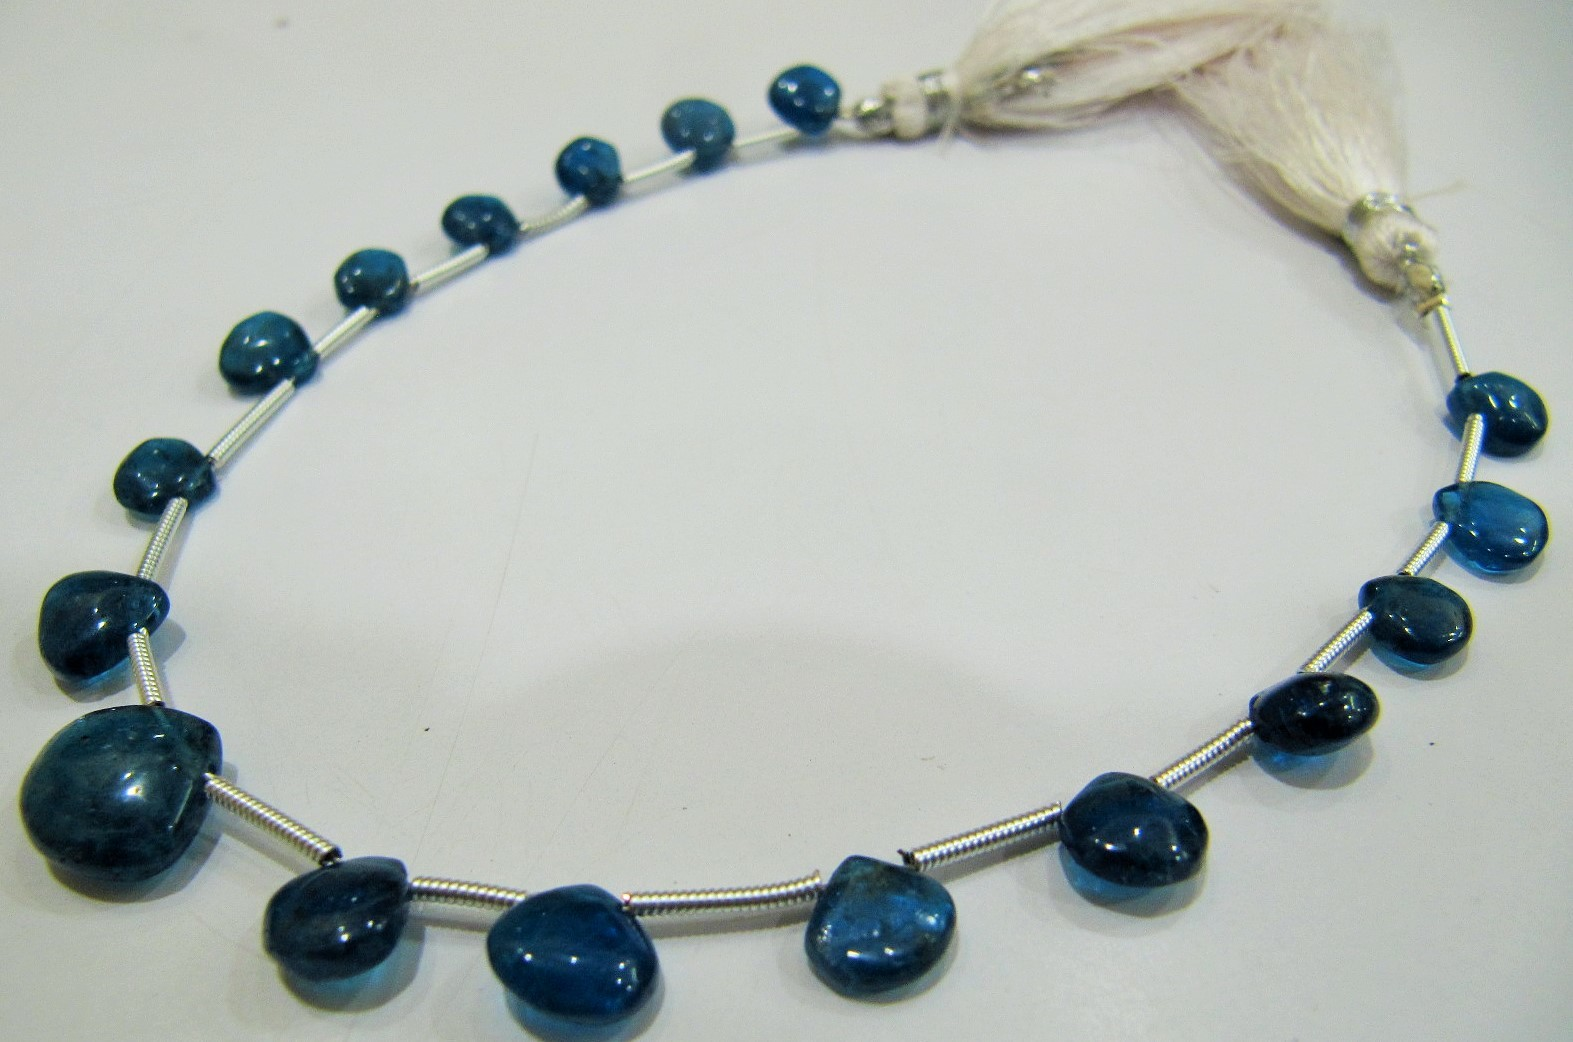 AAA Quality Natural Neon Apatite Heart Shape Beads .